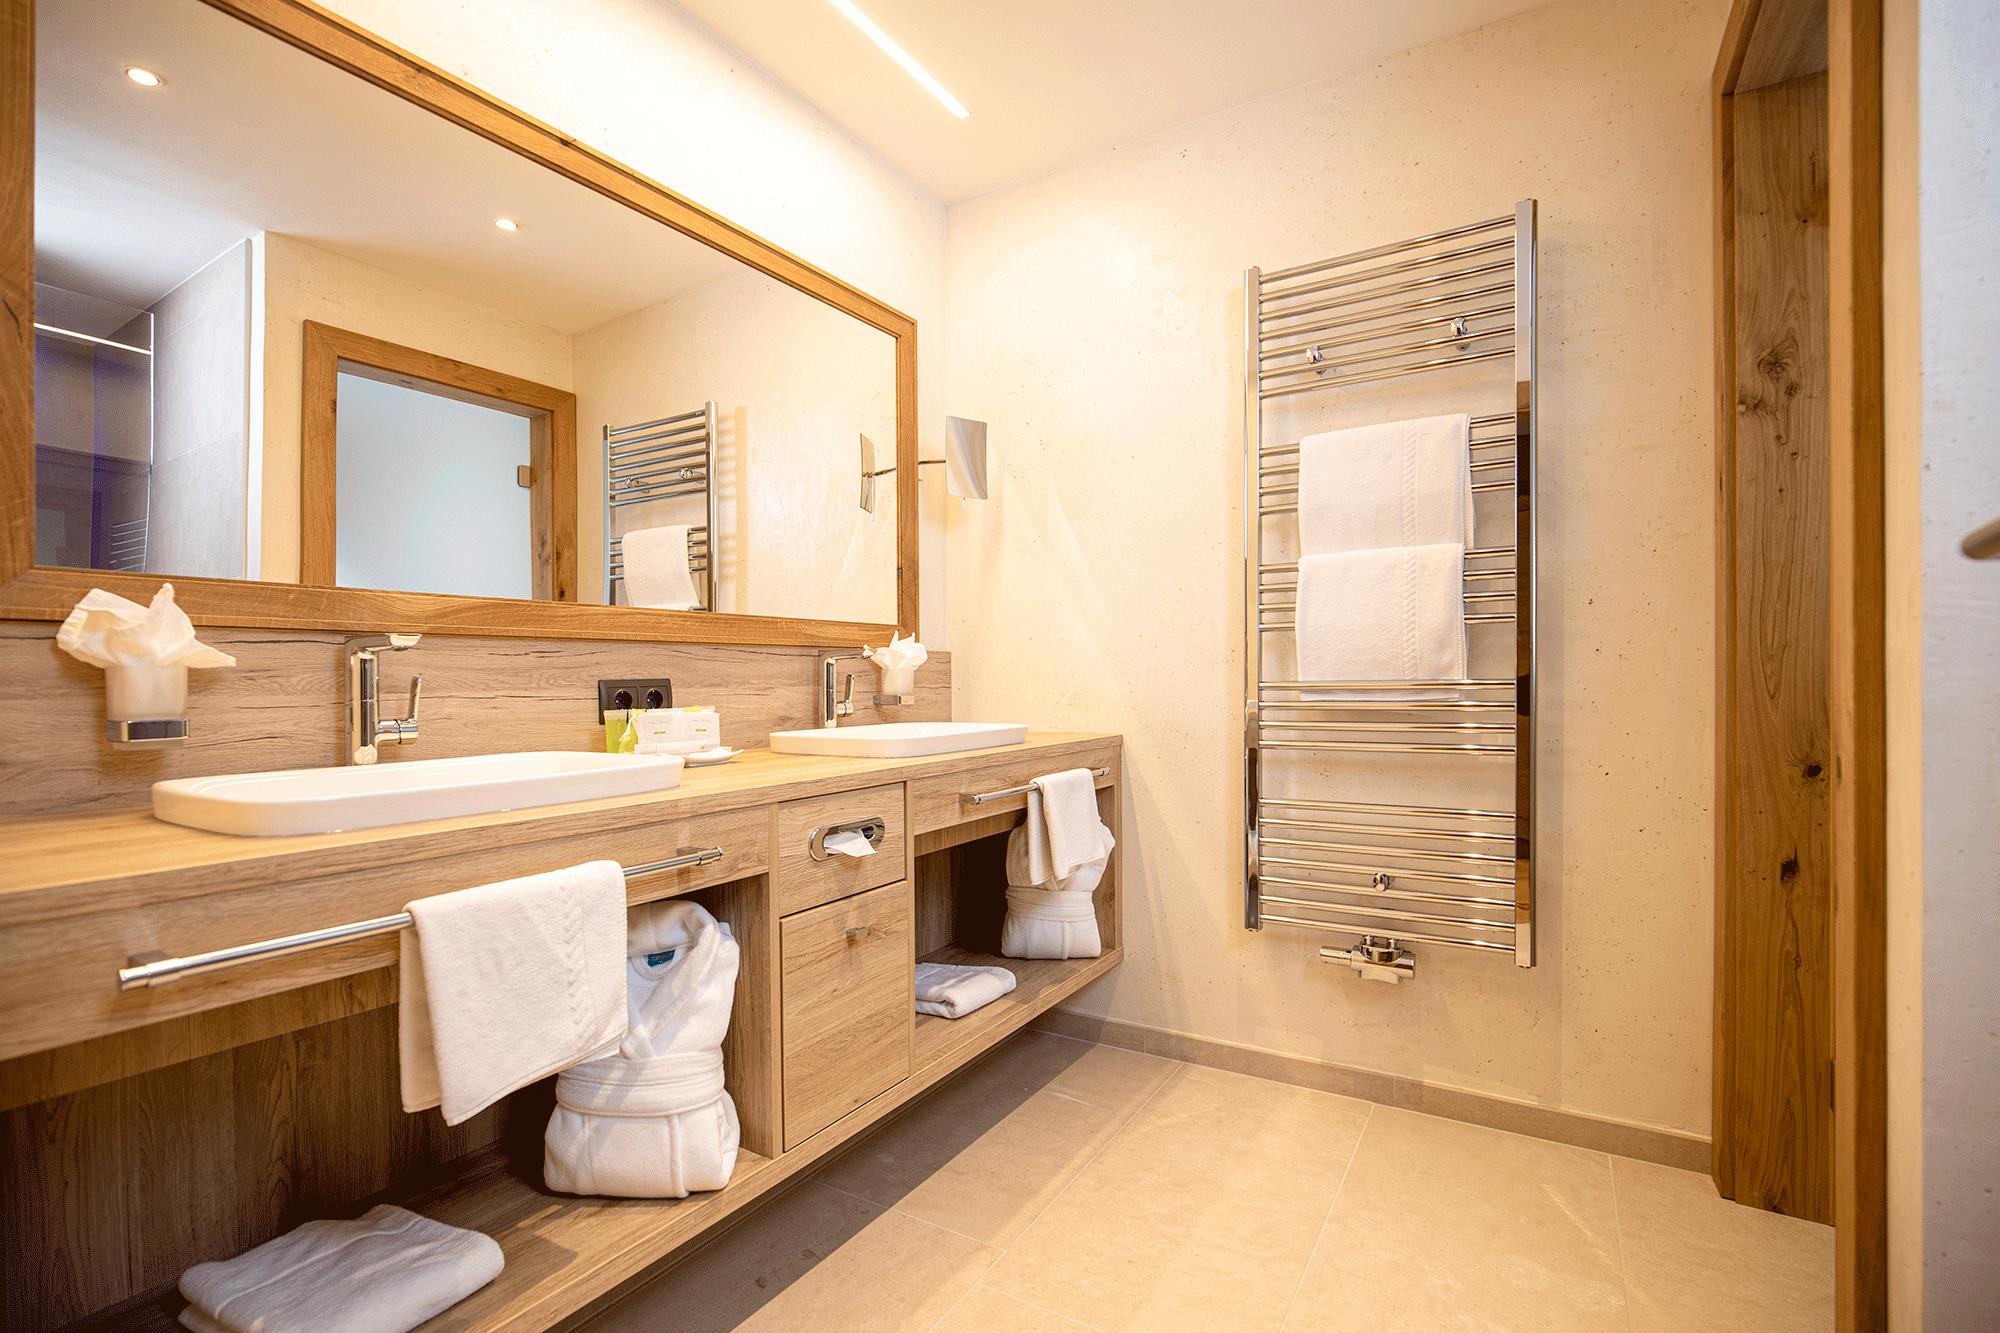 Wohnkomfortzimmer Romantik Badezimmer im Wellnesshotel Alpbacherhof nahe des Skigebierts Ski Juwel